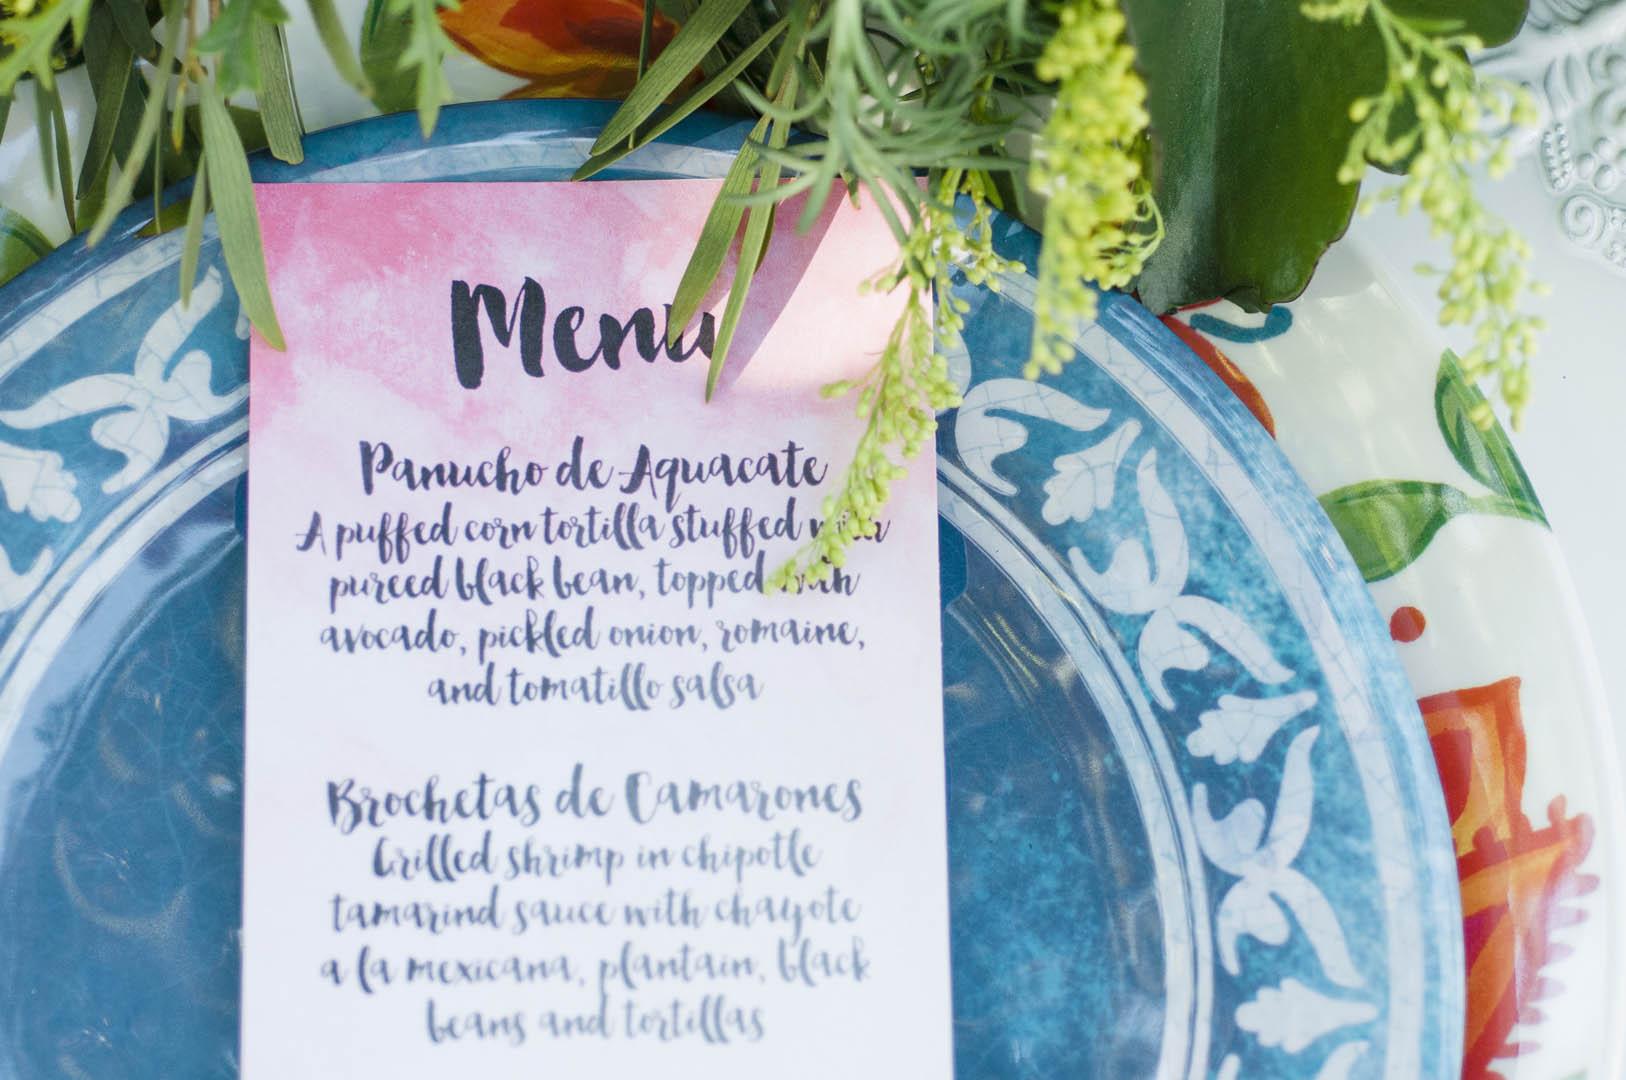 Menu for Fiesta Wedding on Vancouver Island